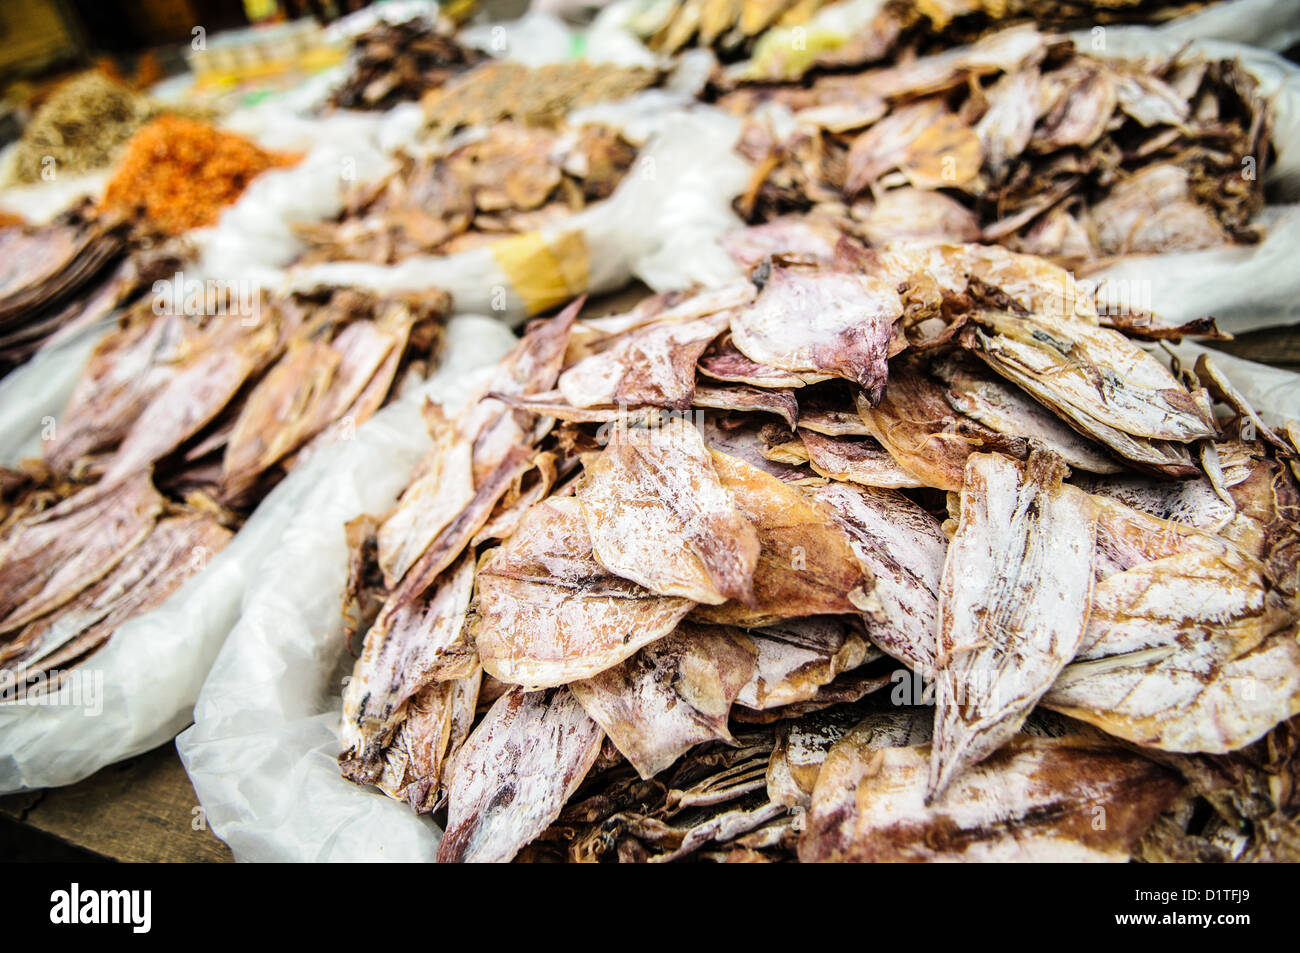 LUANG PRABANG, Laos - Dried squid at the morning market in Luang Prabang, Laos. - Stock Image